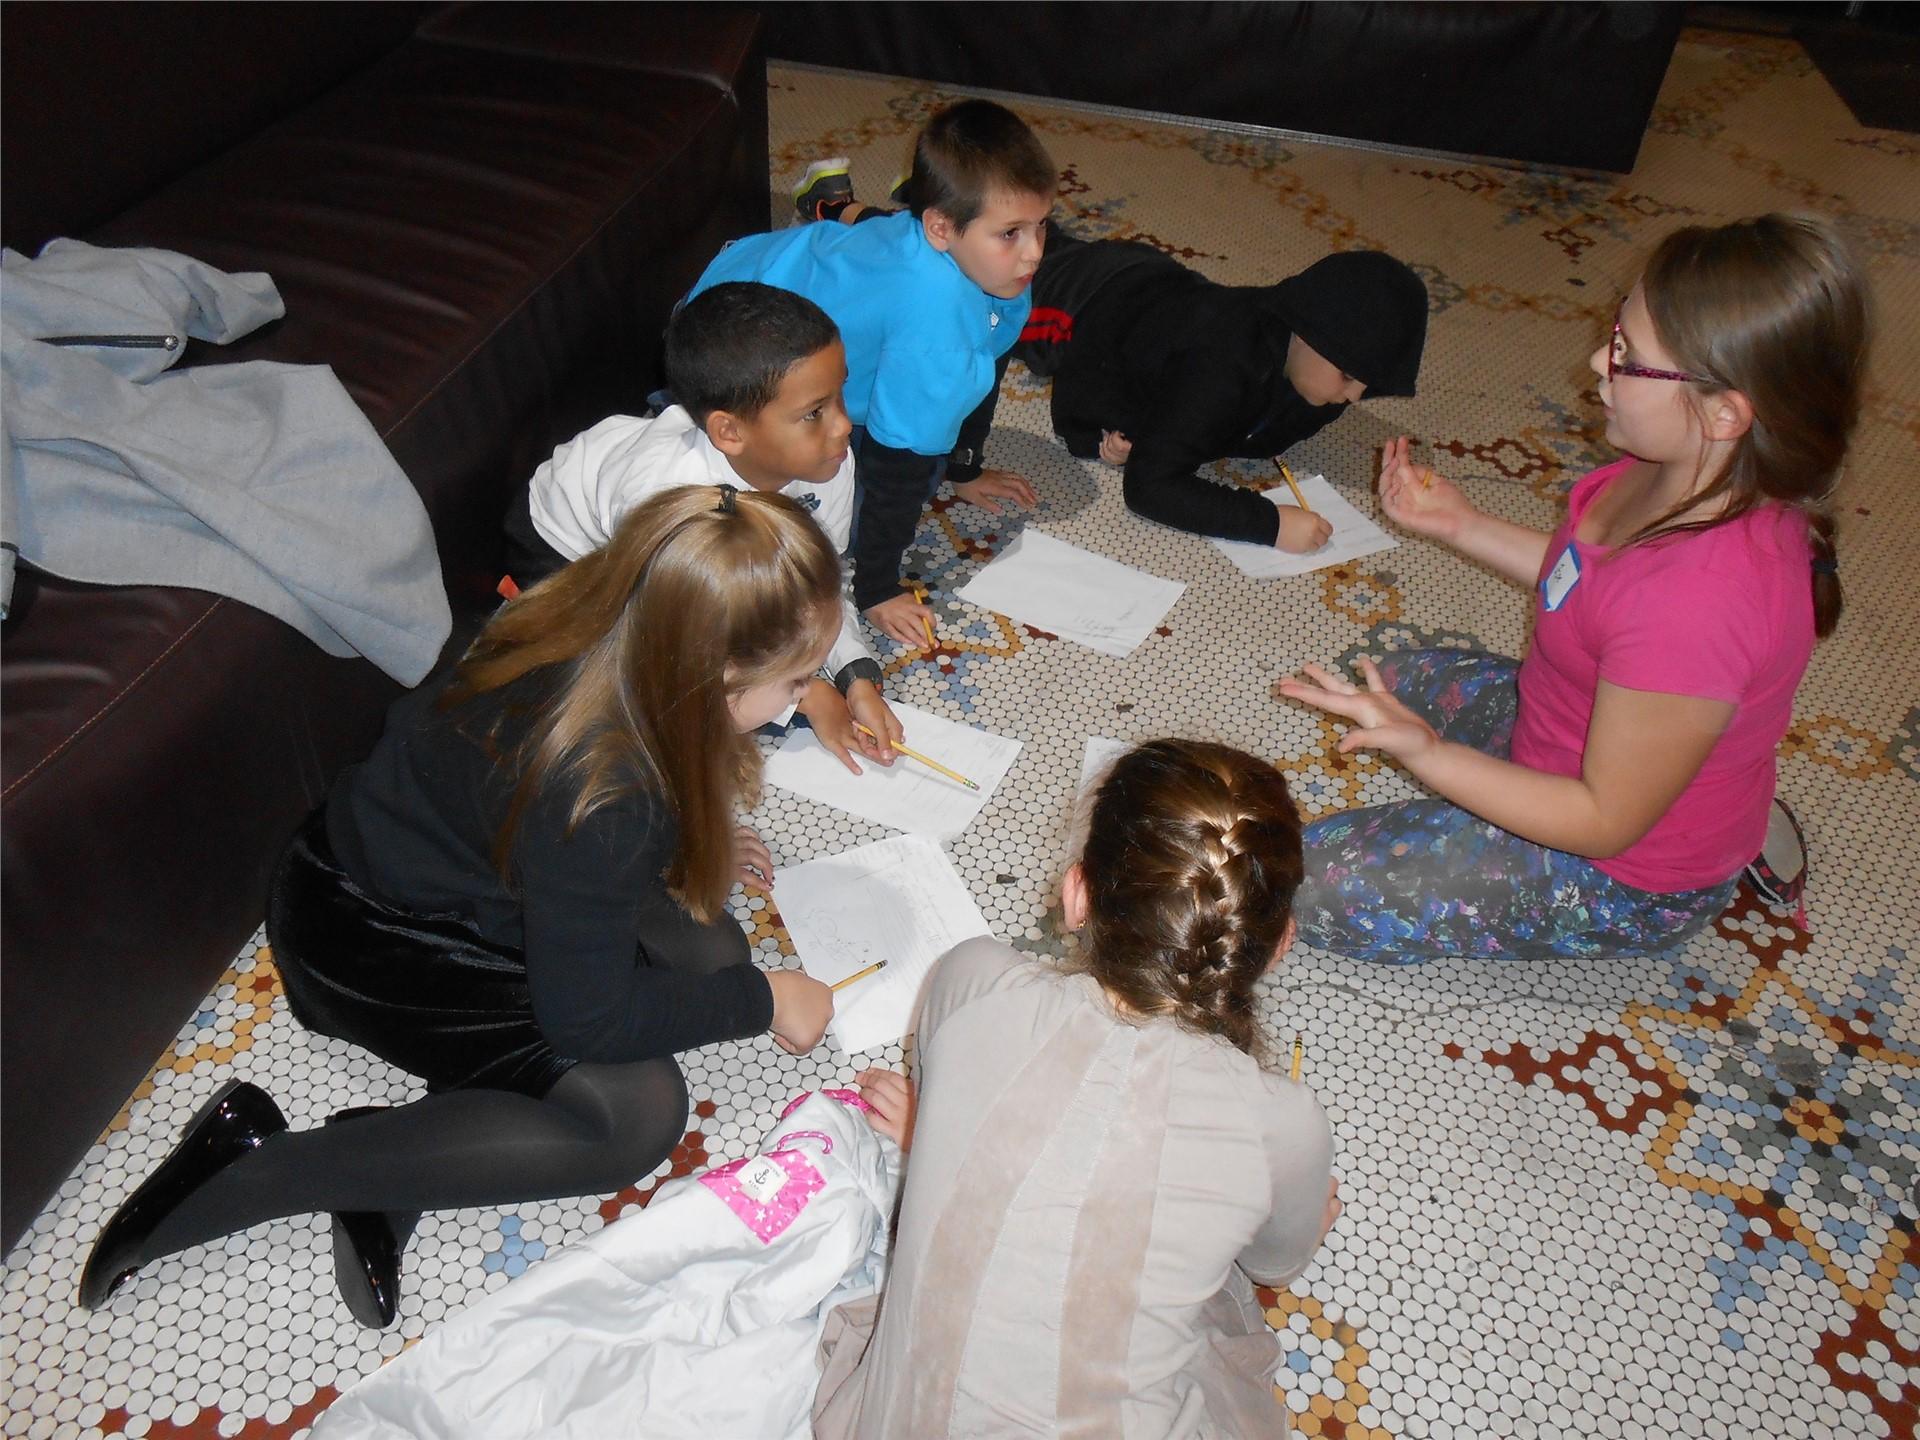 Students at Bricolage radio drama workshop.